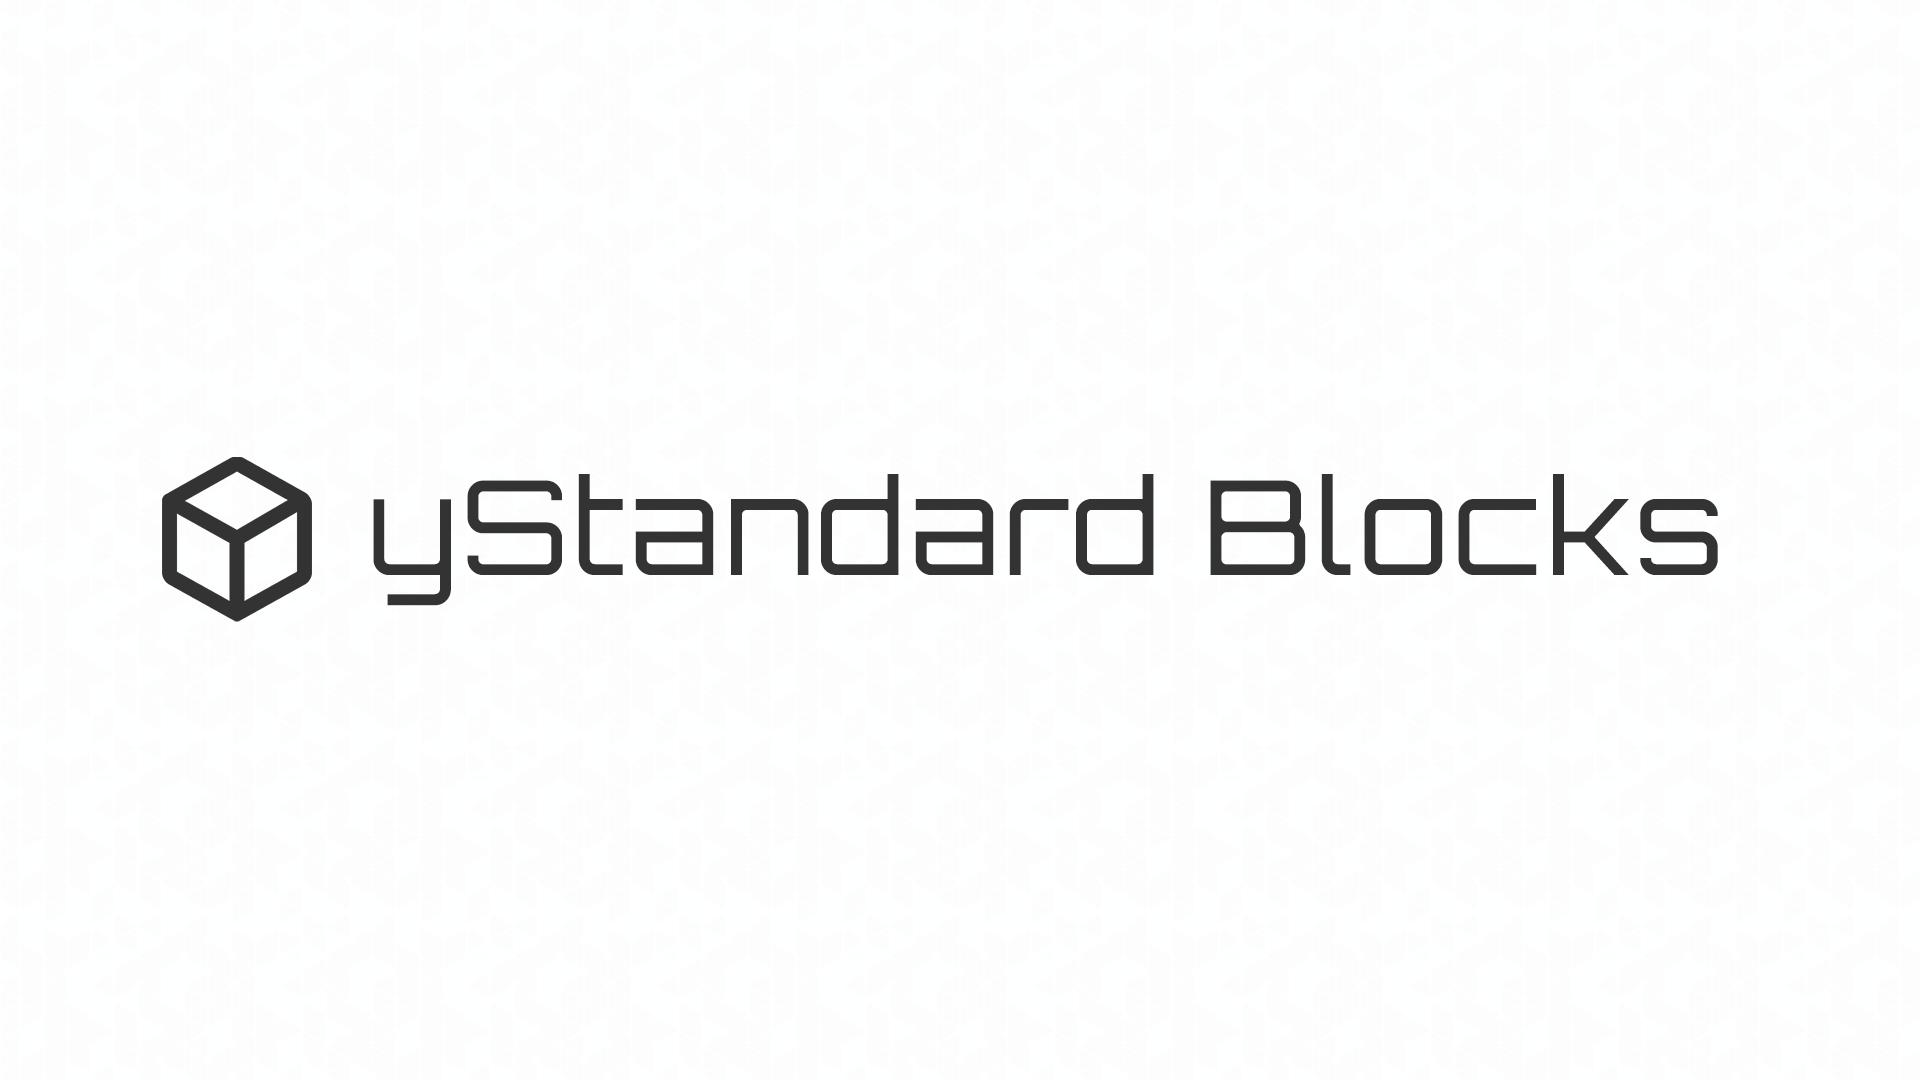 【yStandard Blocks v2.1.0】カスタム見出しブロックのリニューアル・その他細々とした修正